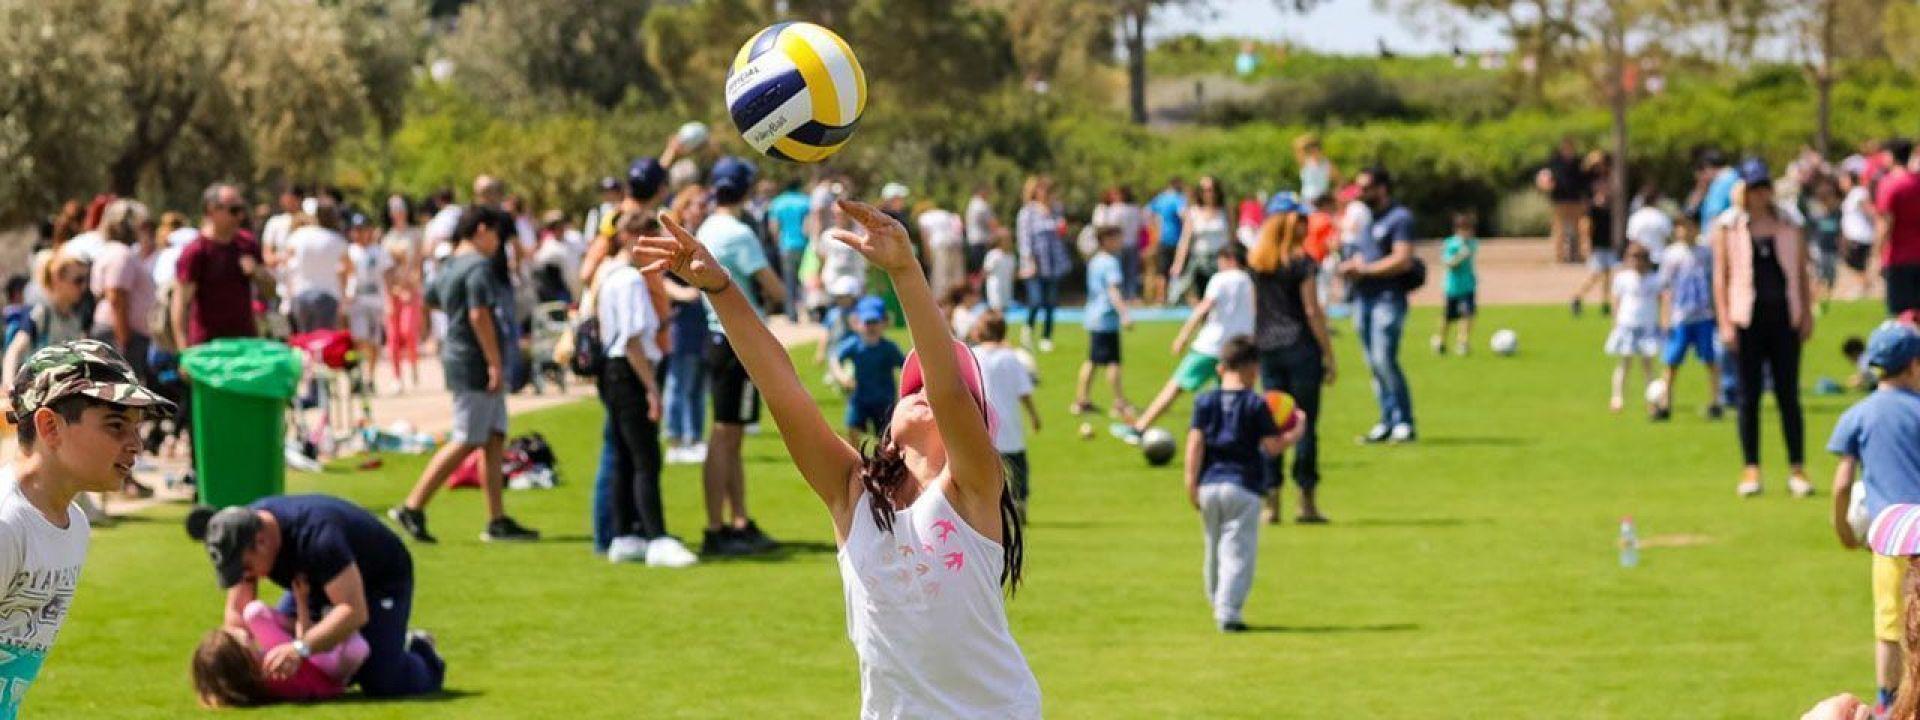 Cancellation: Mini Volley - Εικόνα